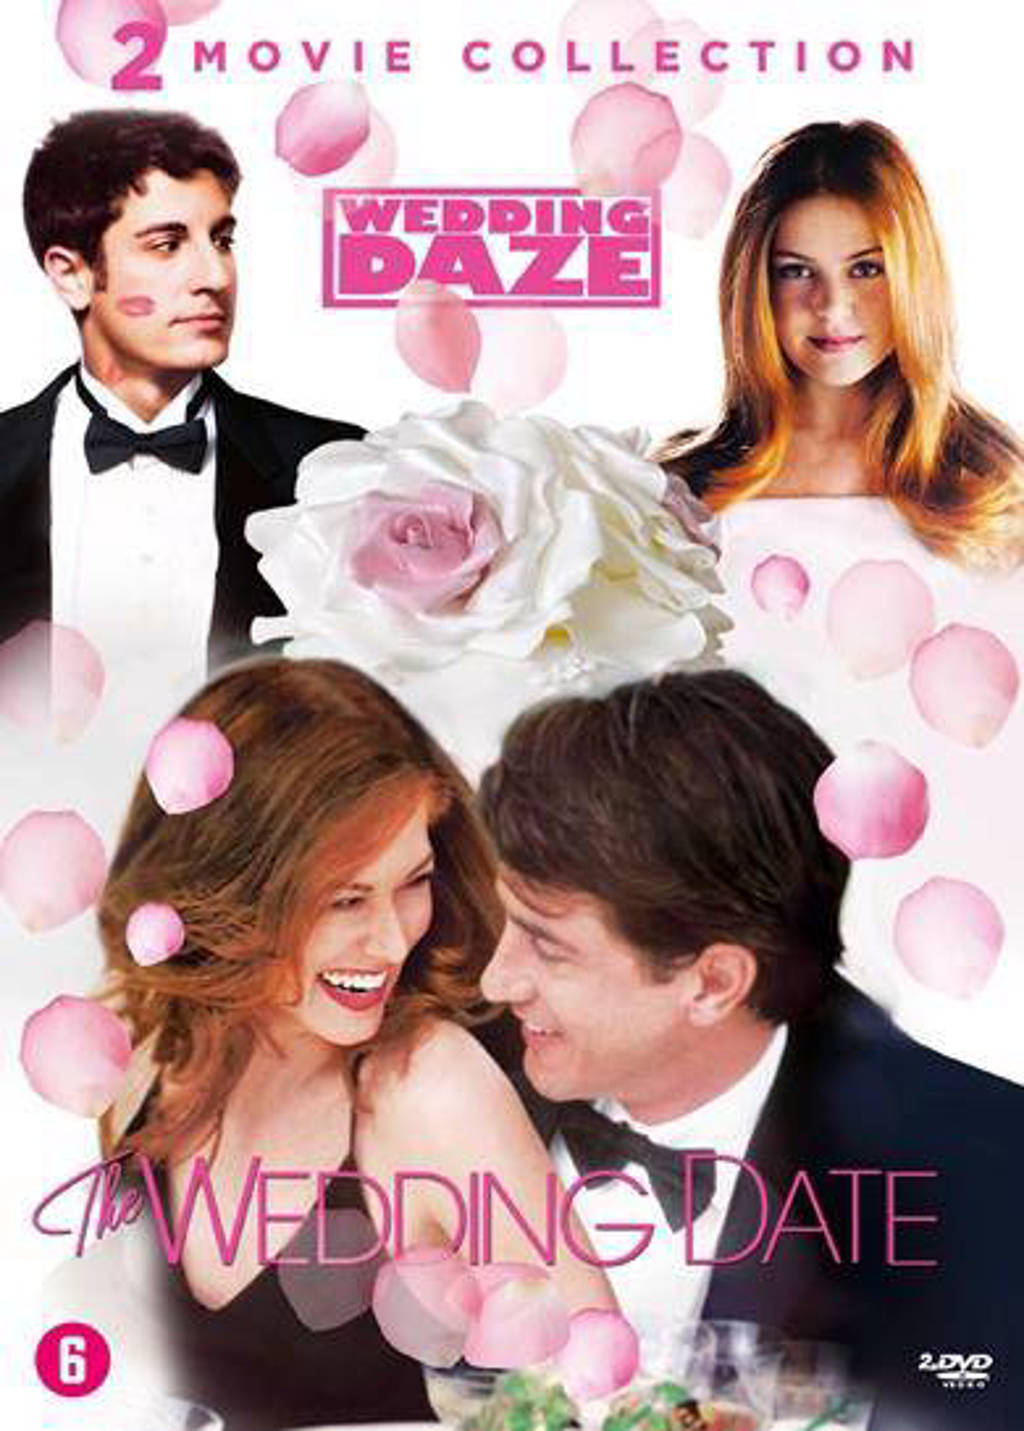 Wedding date/Wedding daze (DVD)